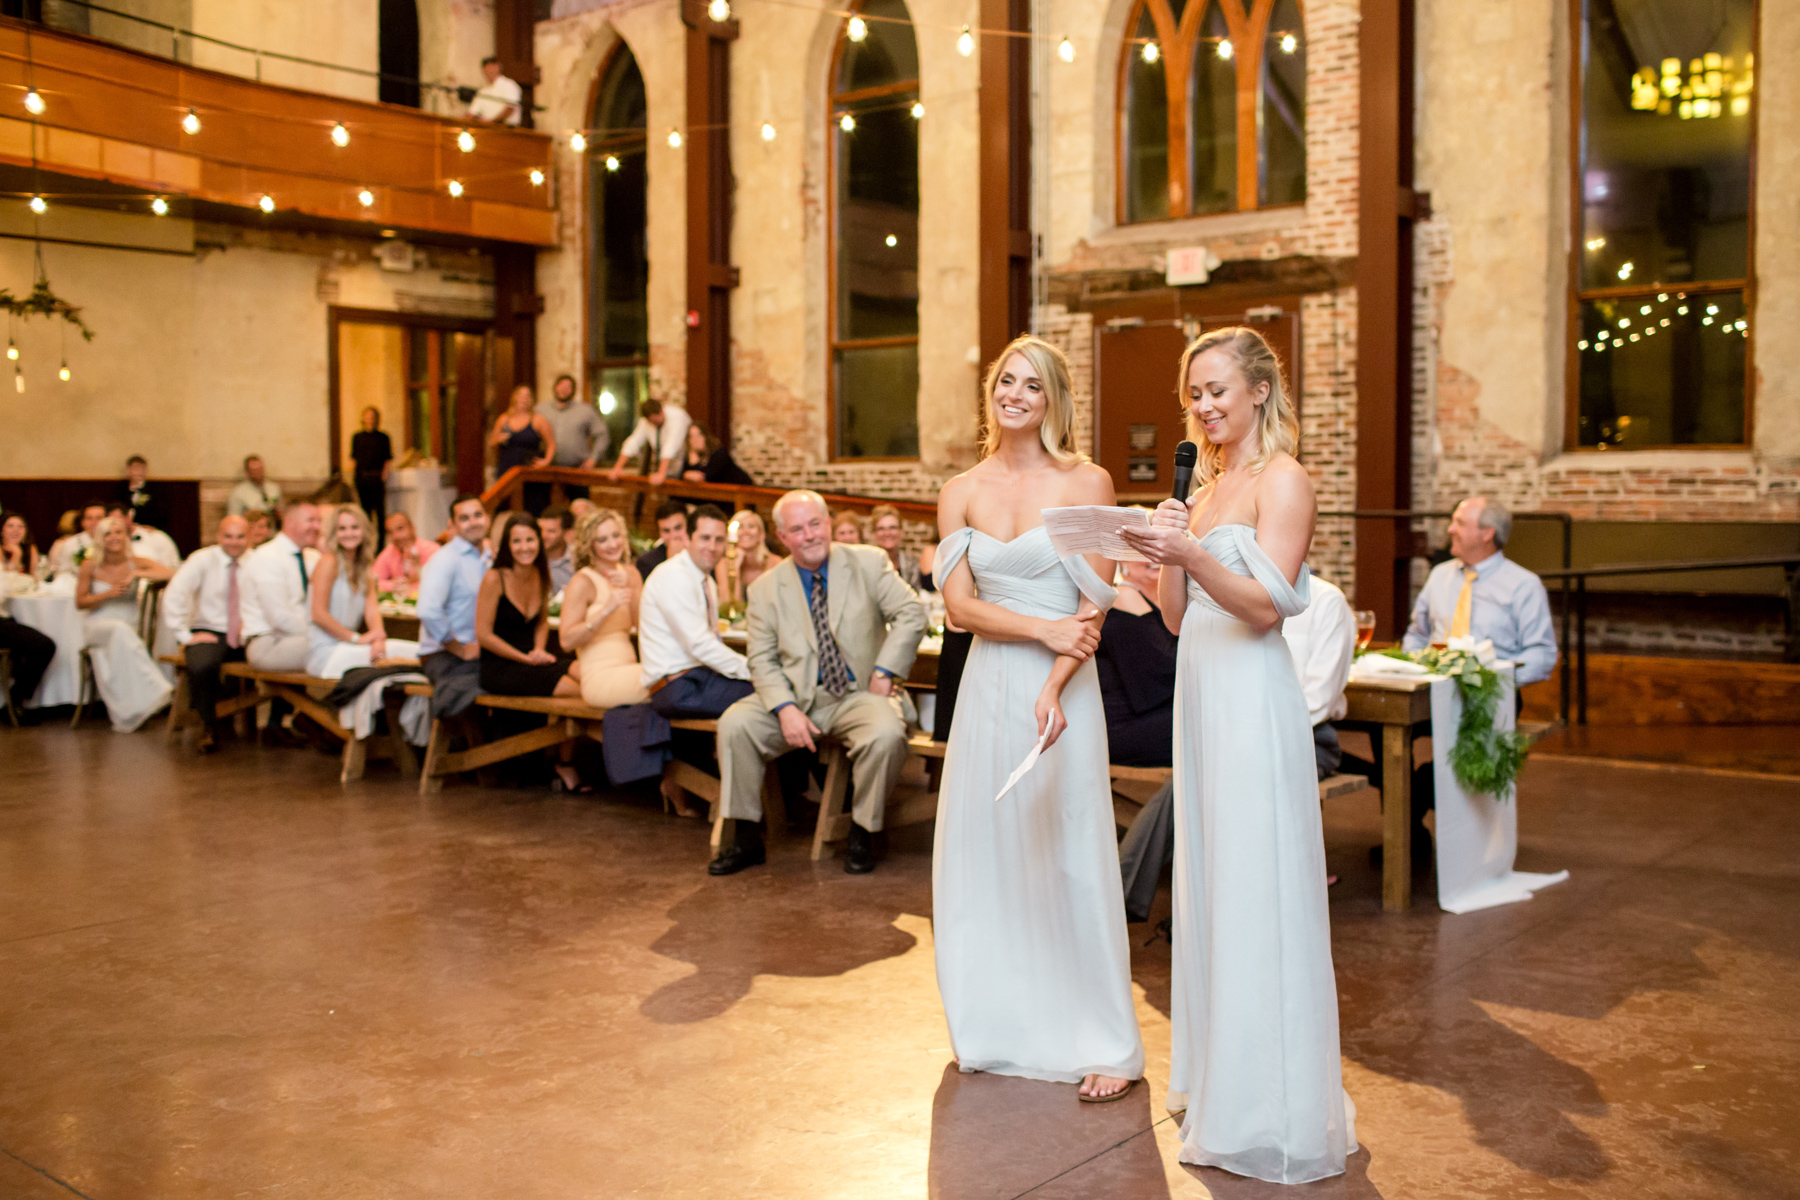 NC-wedding-venues-film-photographer-06.jpg